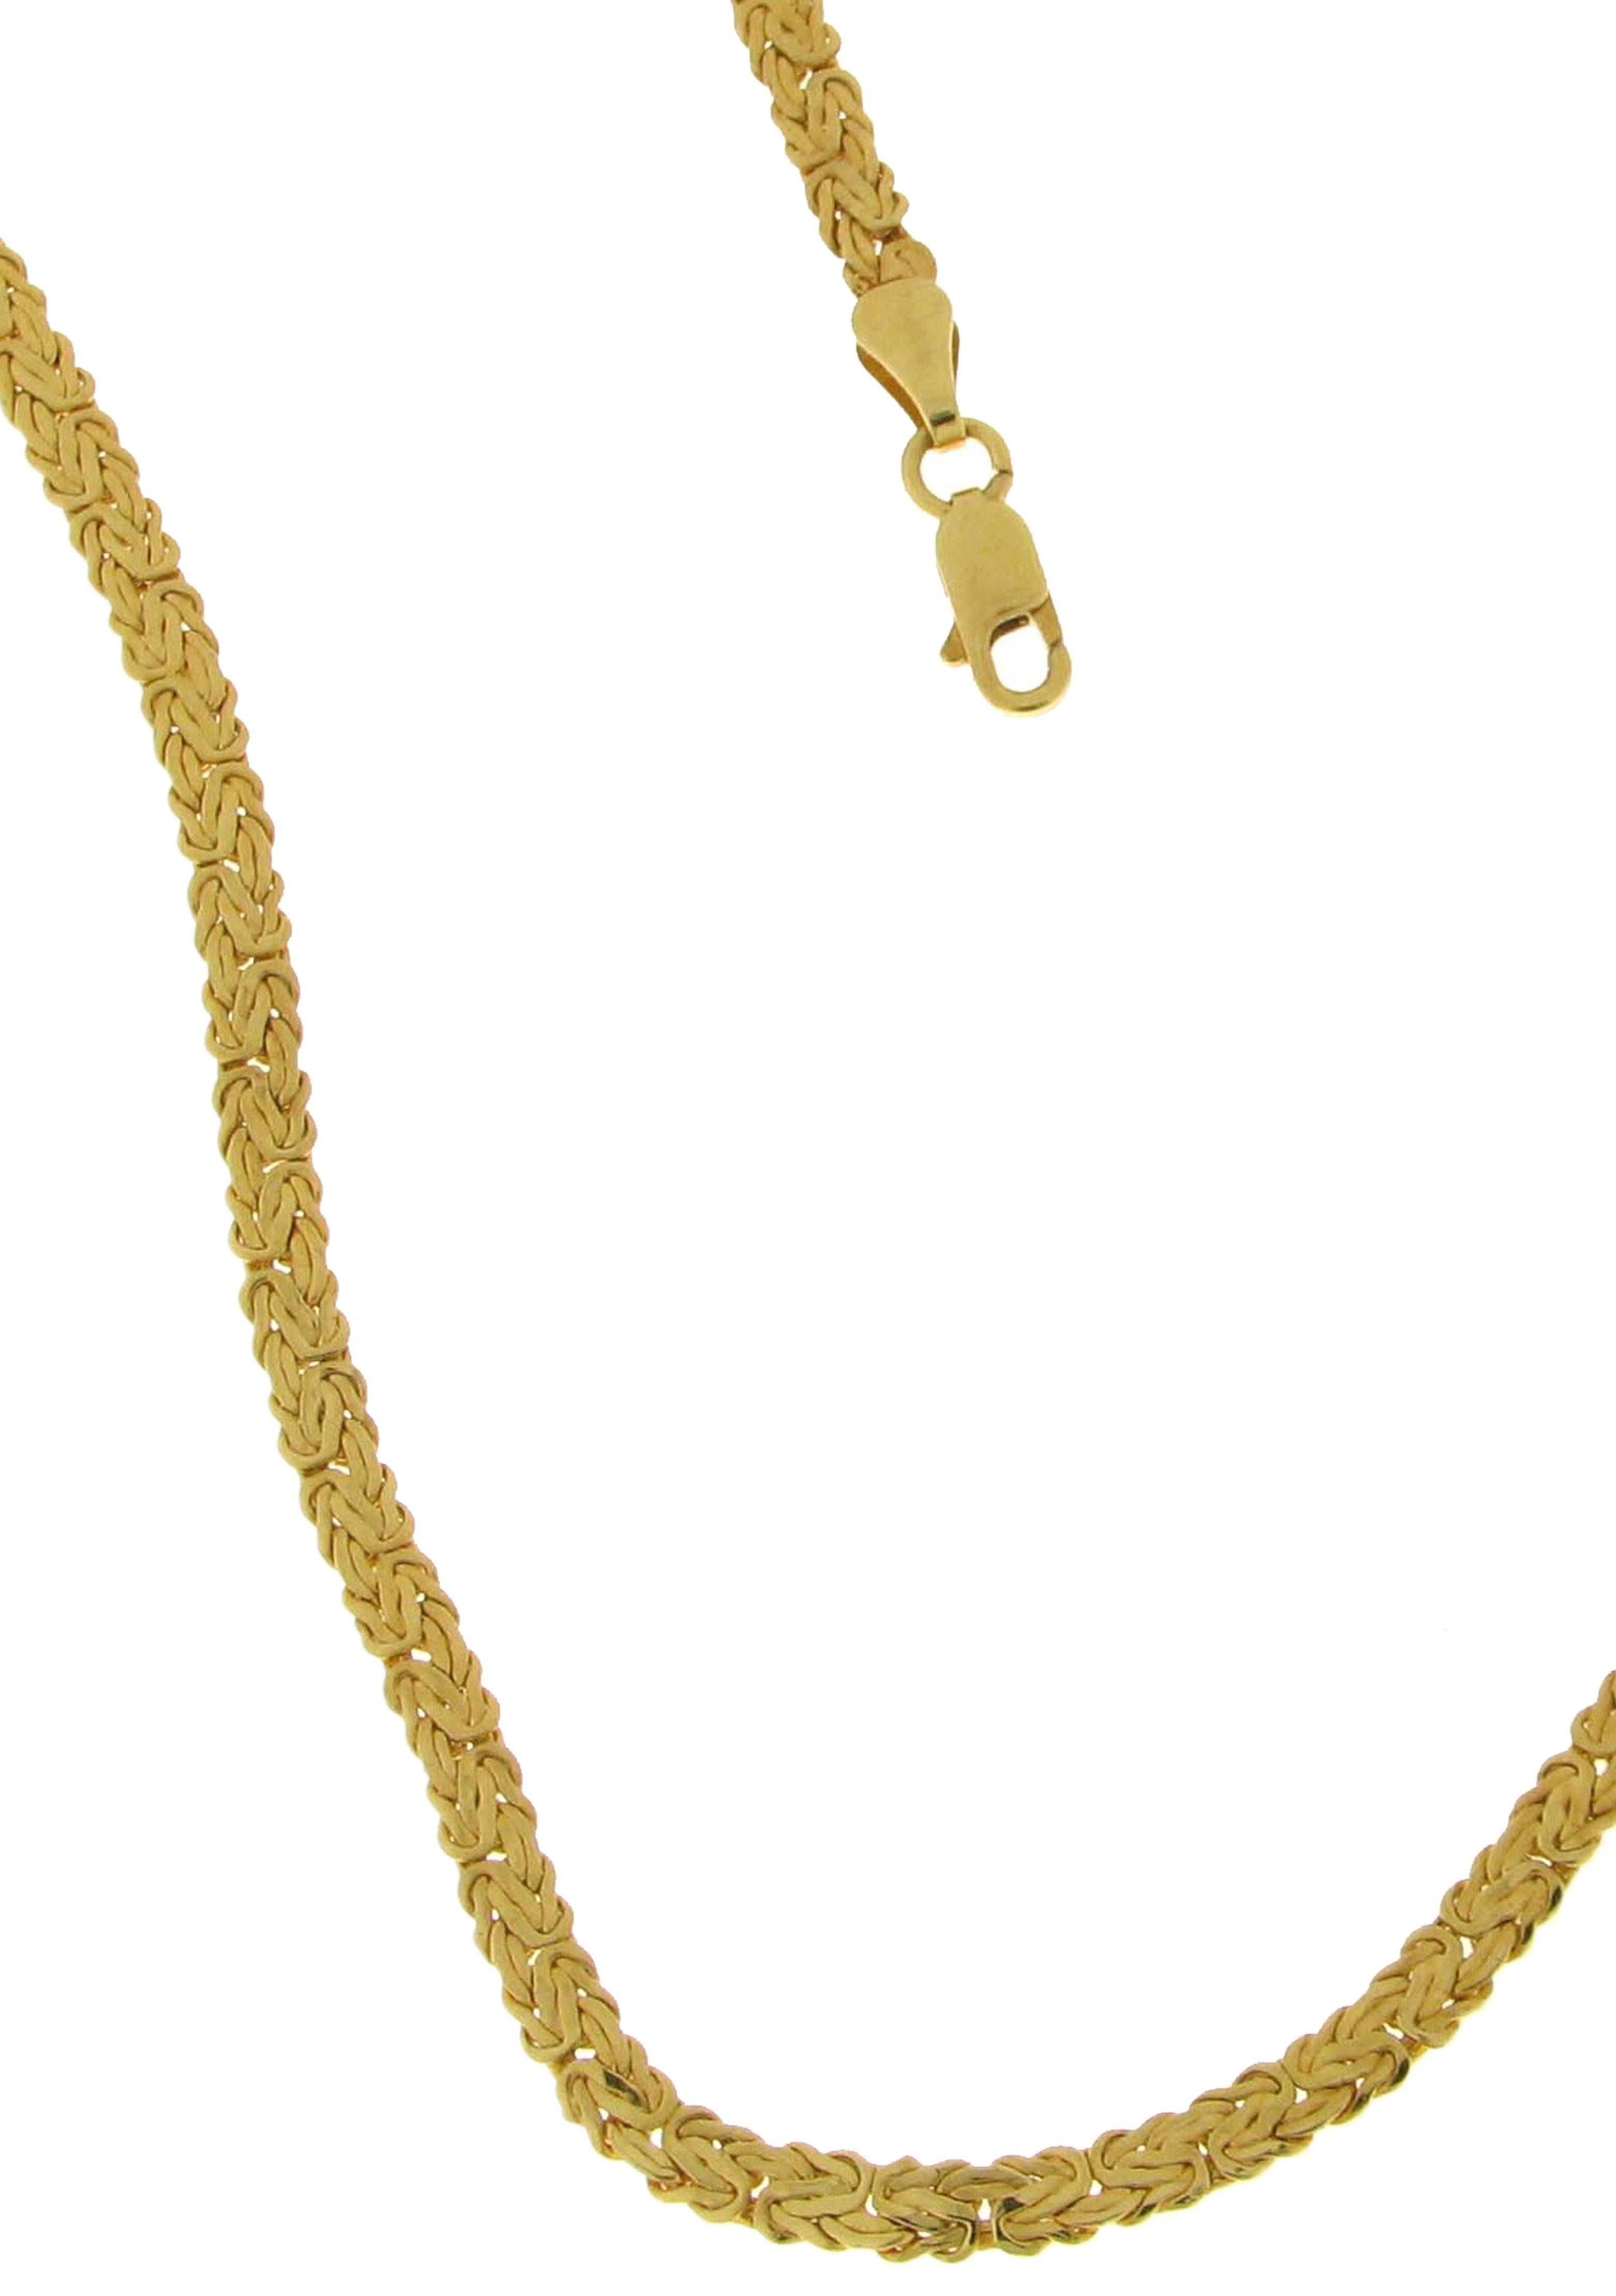 Firetti armsieraad: armband met koningsschakels - verschillende betaalmethodes